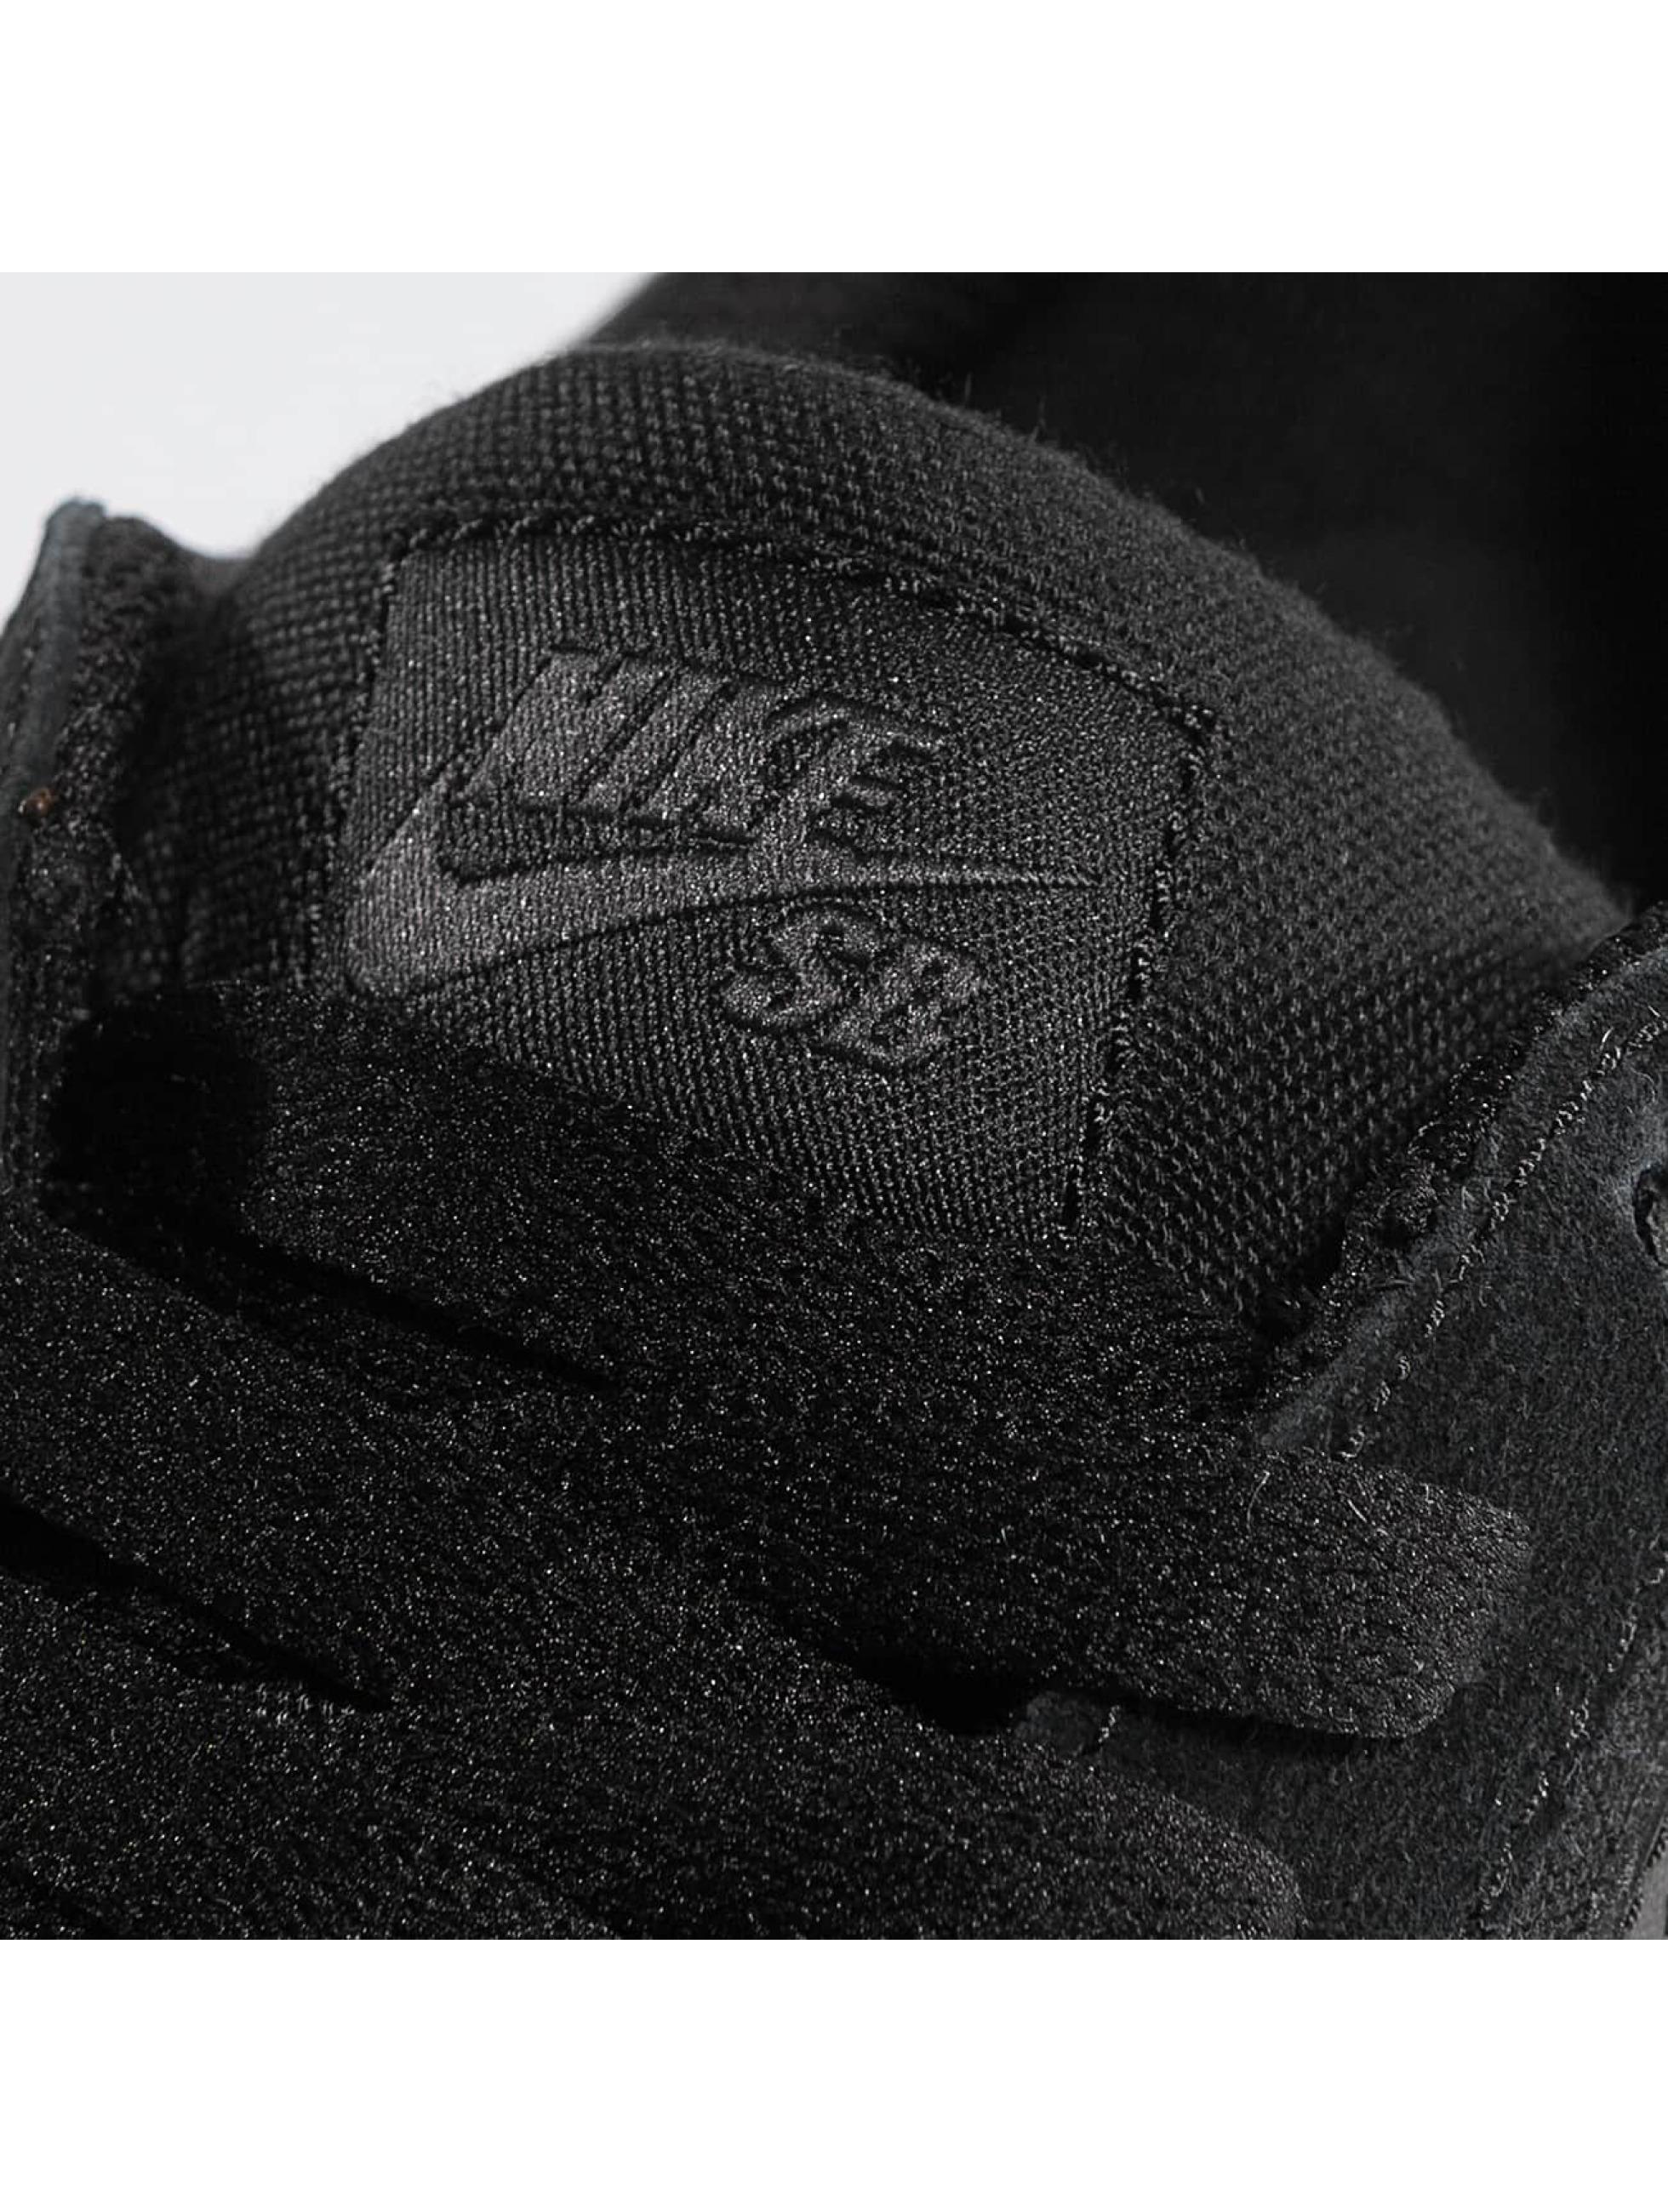 Nike SB Sneakers SB Satire II black